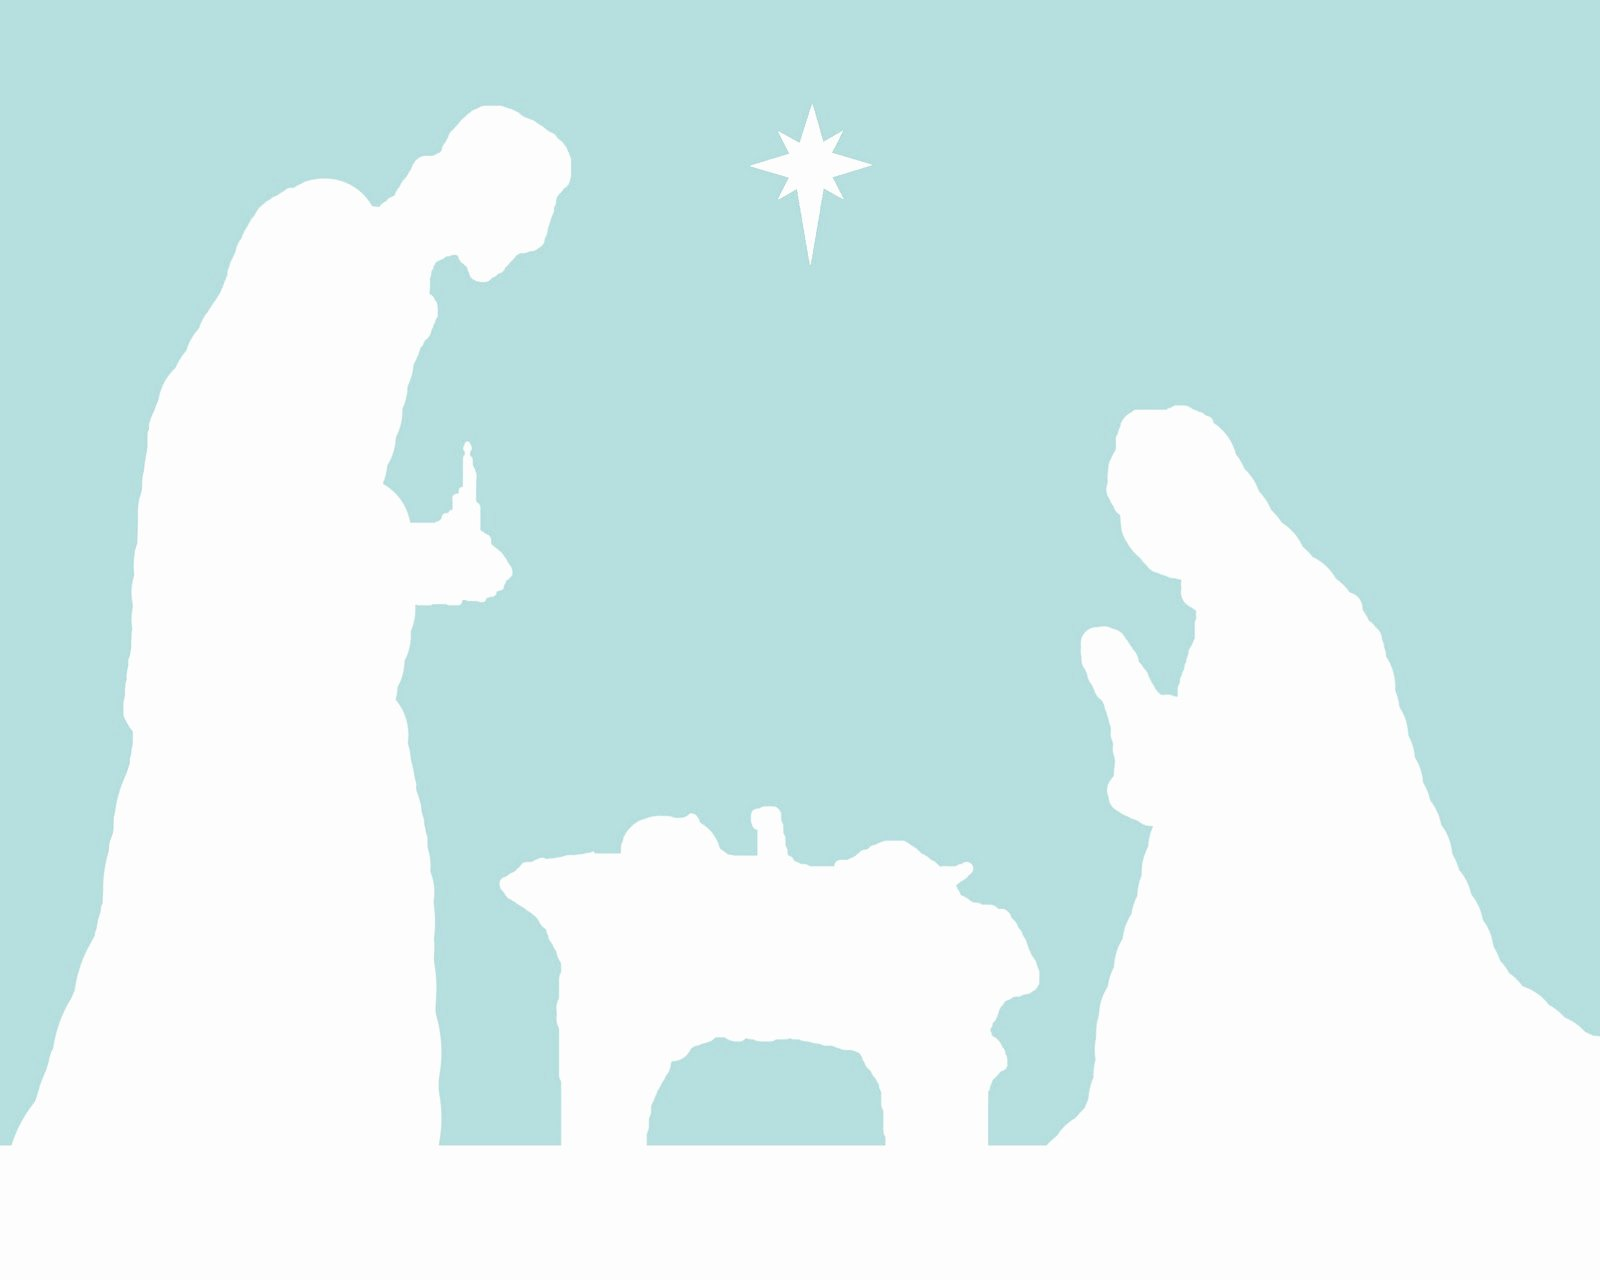 Nativity Silhouette Printable Inspirational Peace In the Pandemonium December 2010